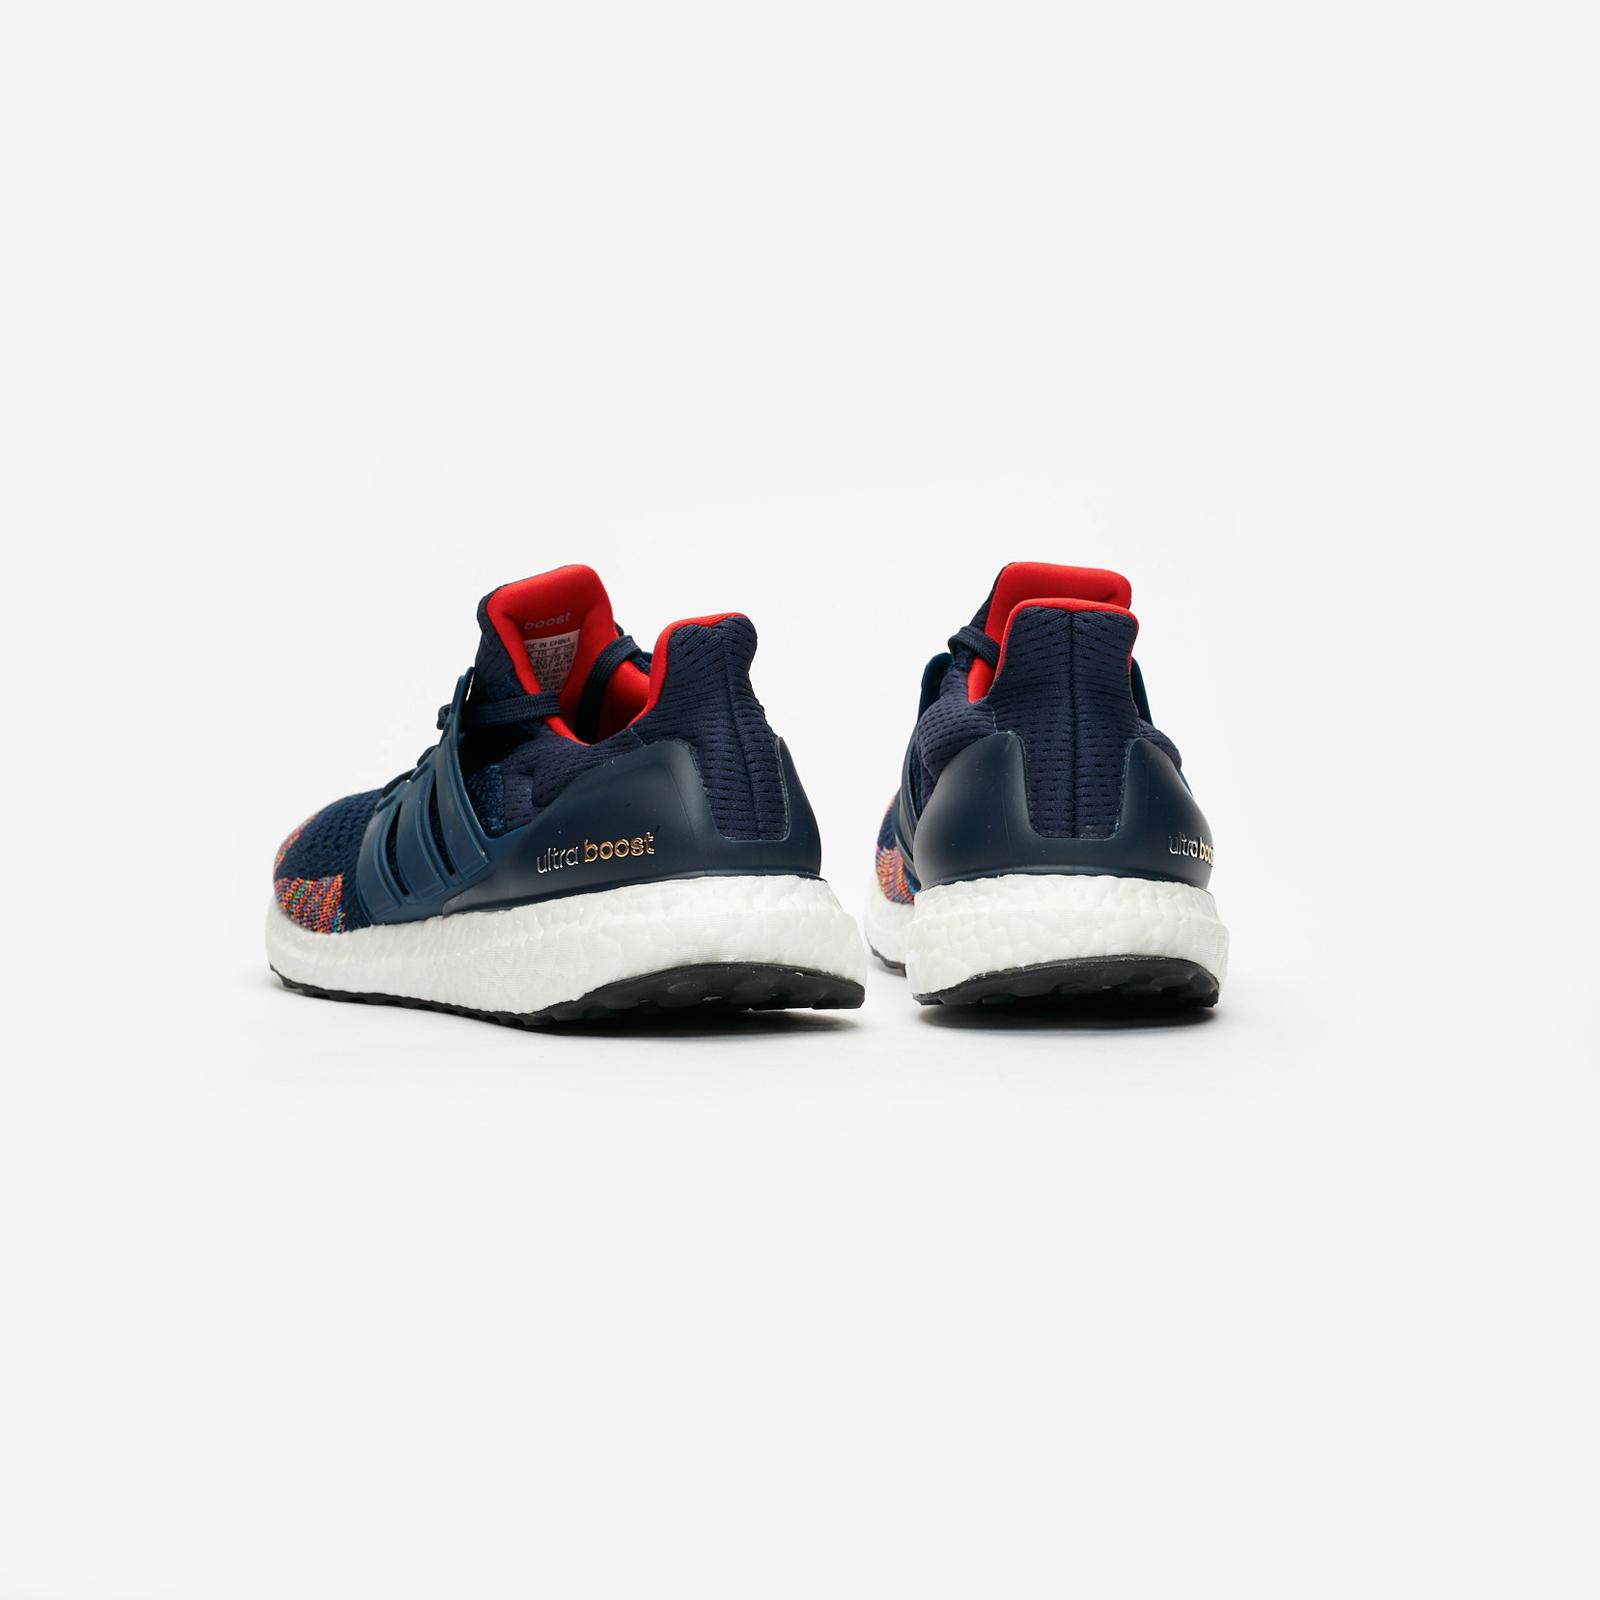 37e88c4fe adidas Ultraboost Ltd - Bb7801 - Sneakersnstuff